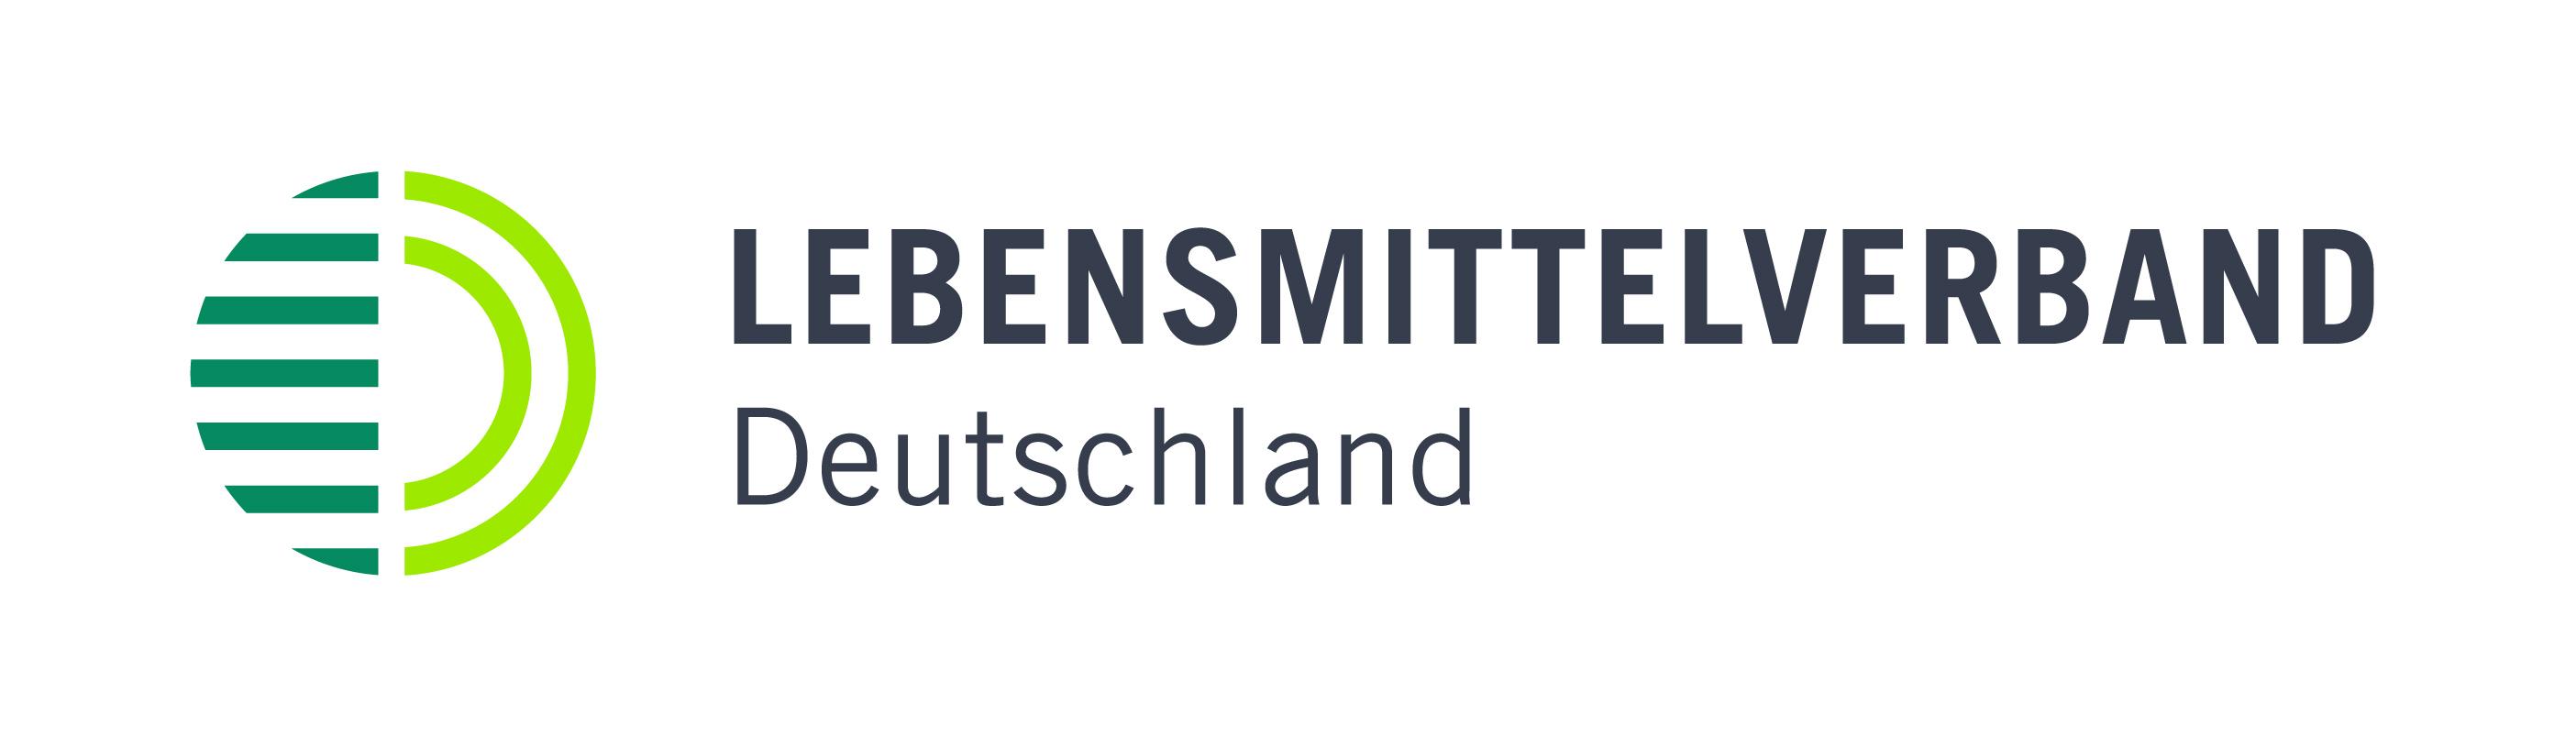 Logo-Lebensmittelverband-Deutschland-de-Vers1